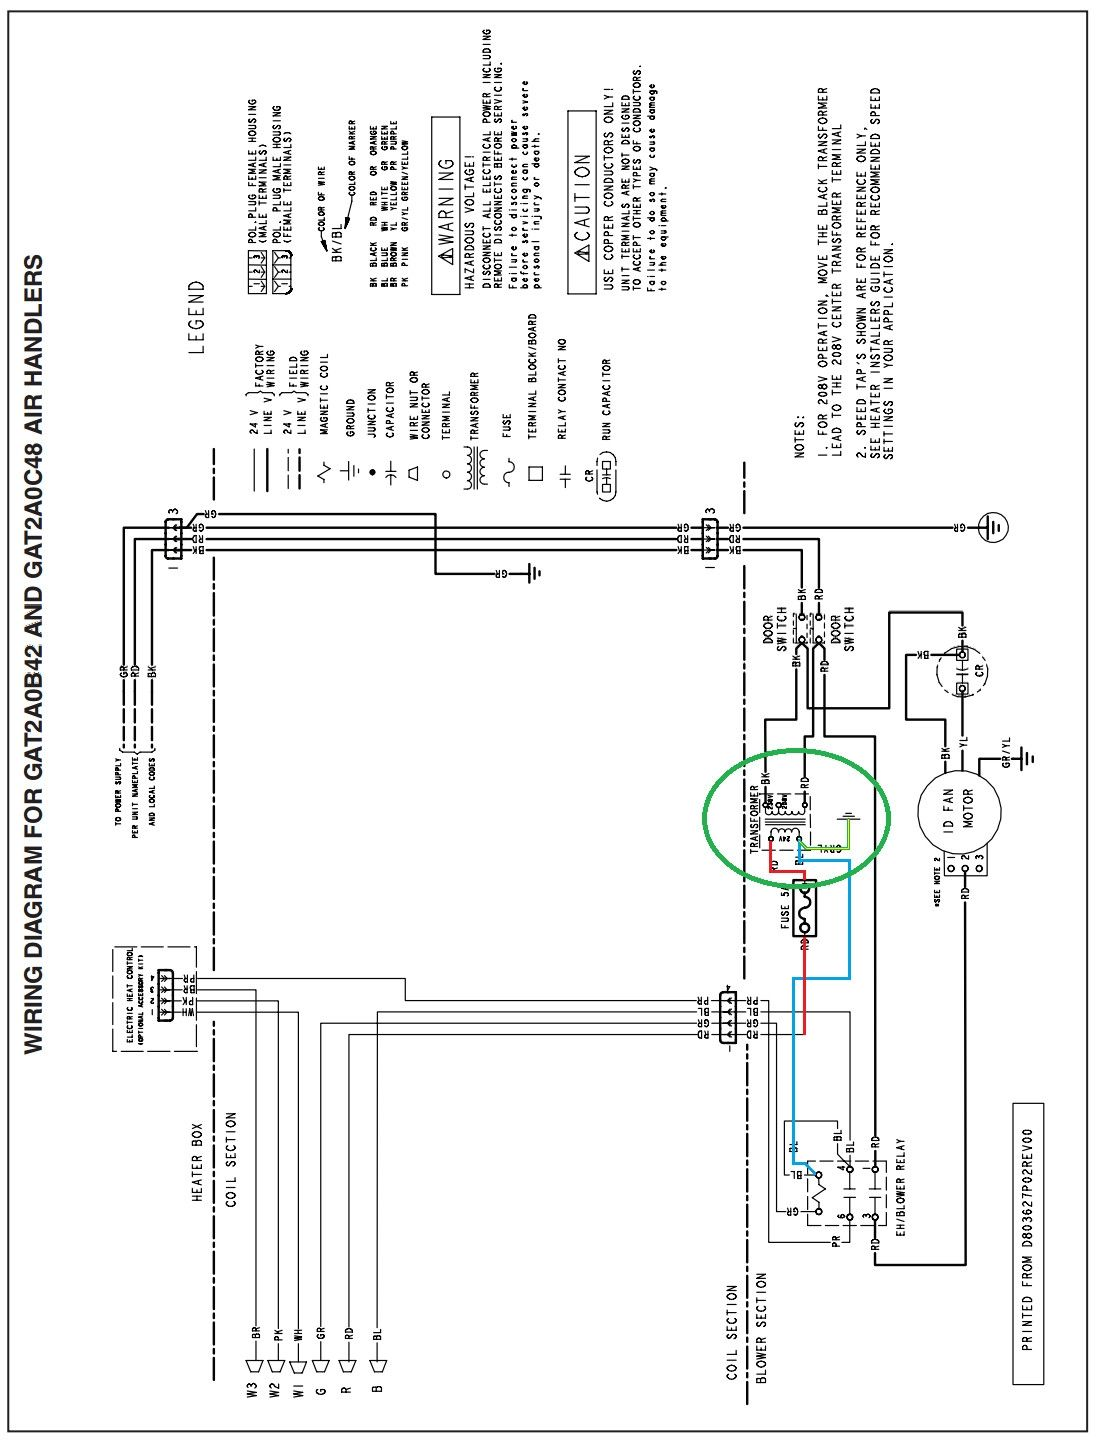 Goodman Air Handler Wiring Diagram 2x12 Trane Hvac With Deconstructmyhouse